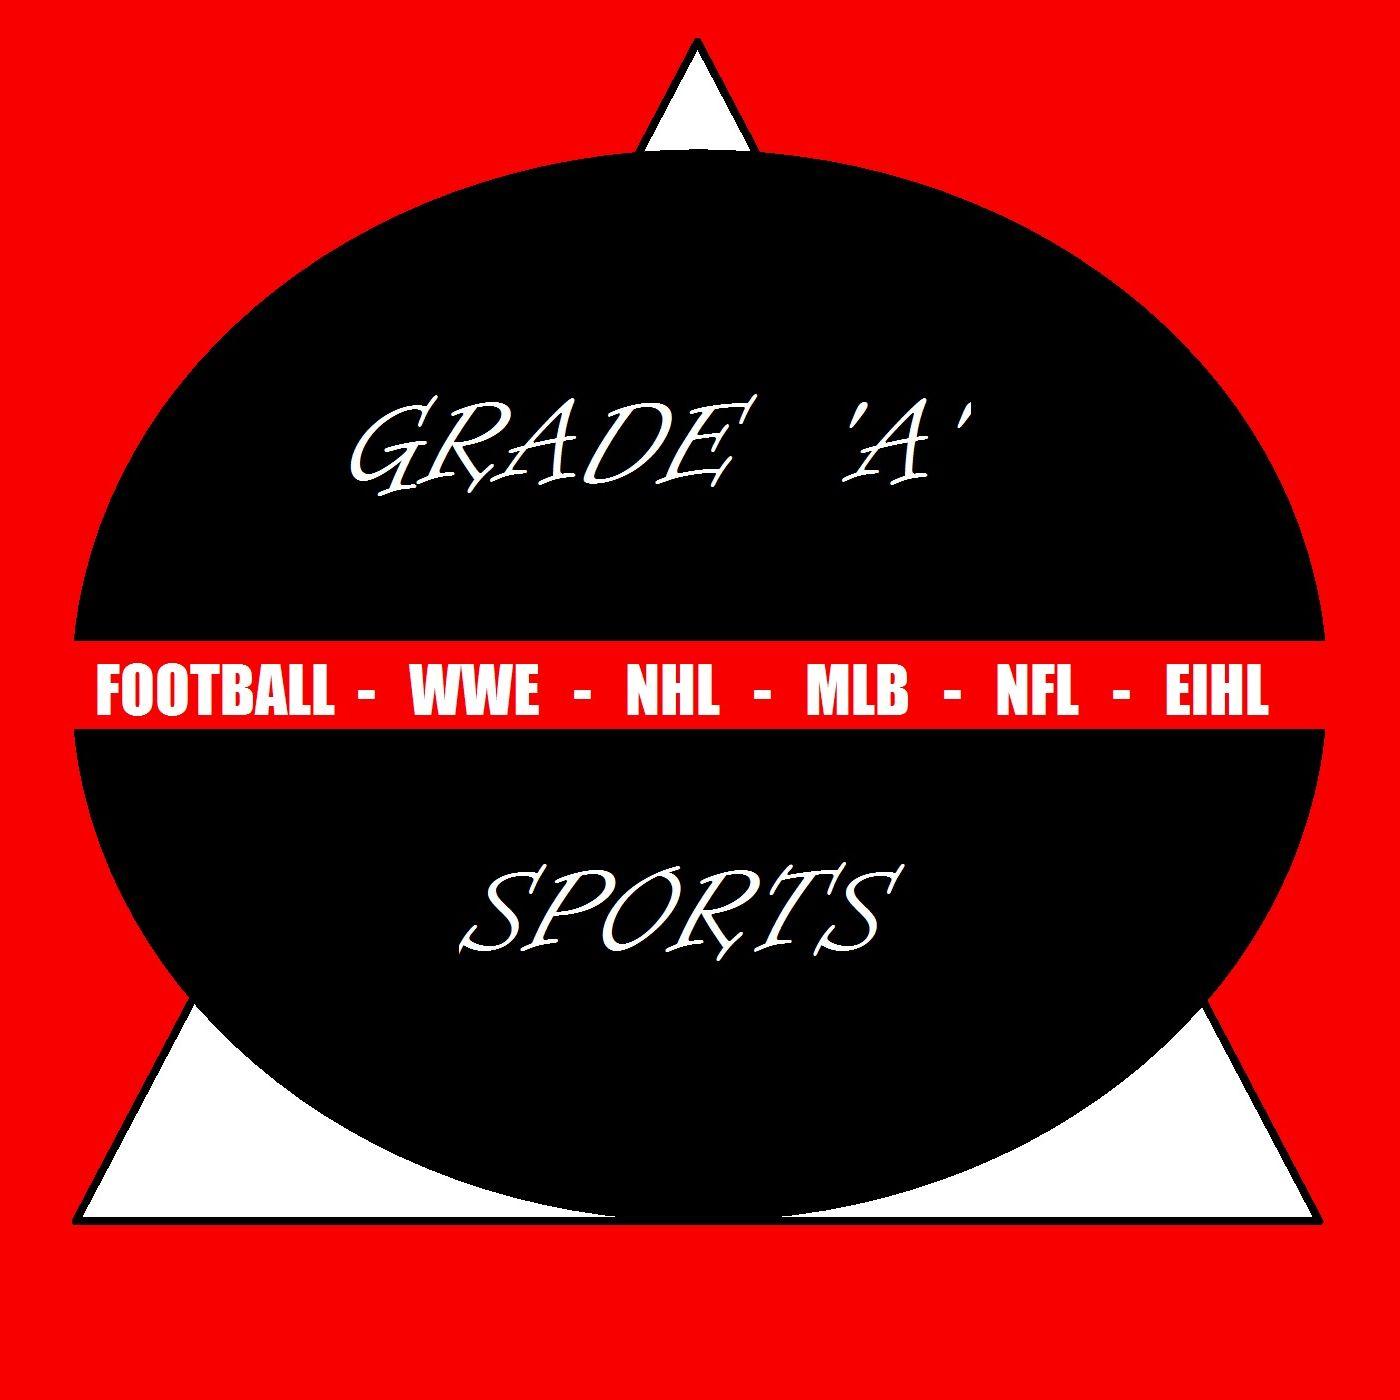 Grade 'A' Sports